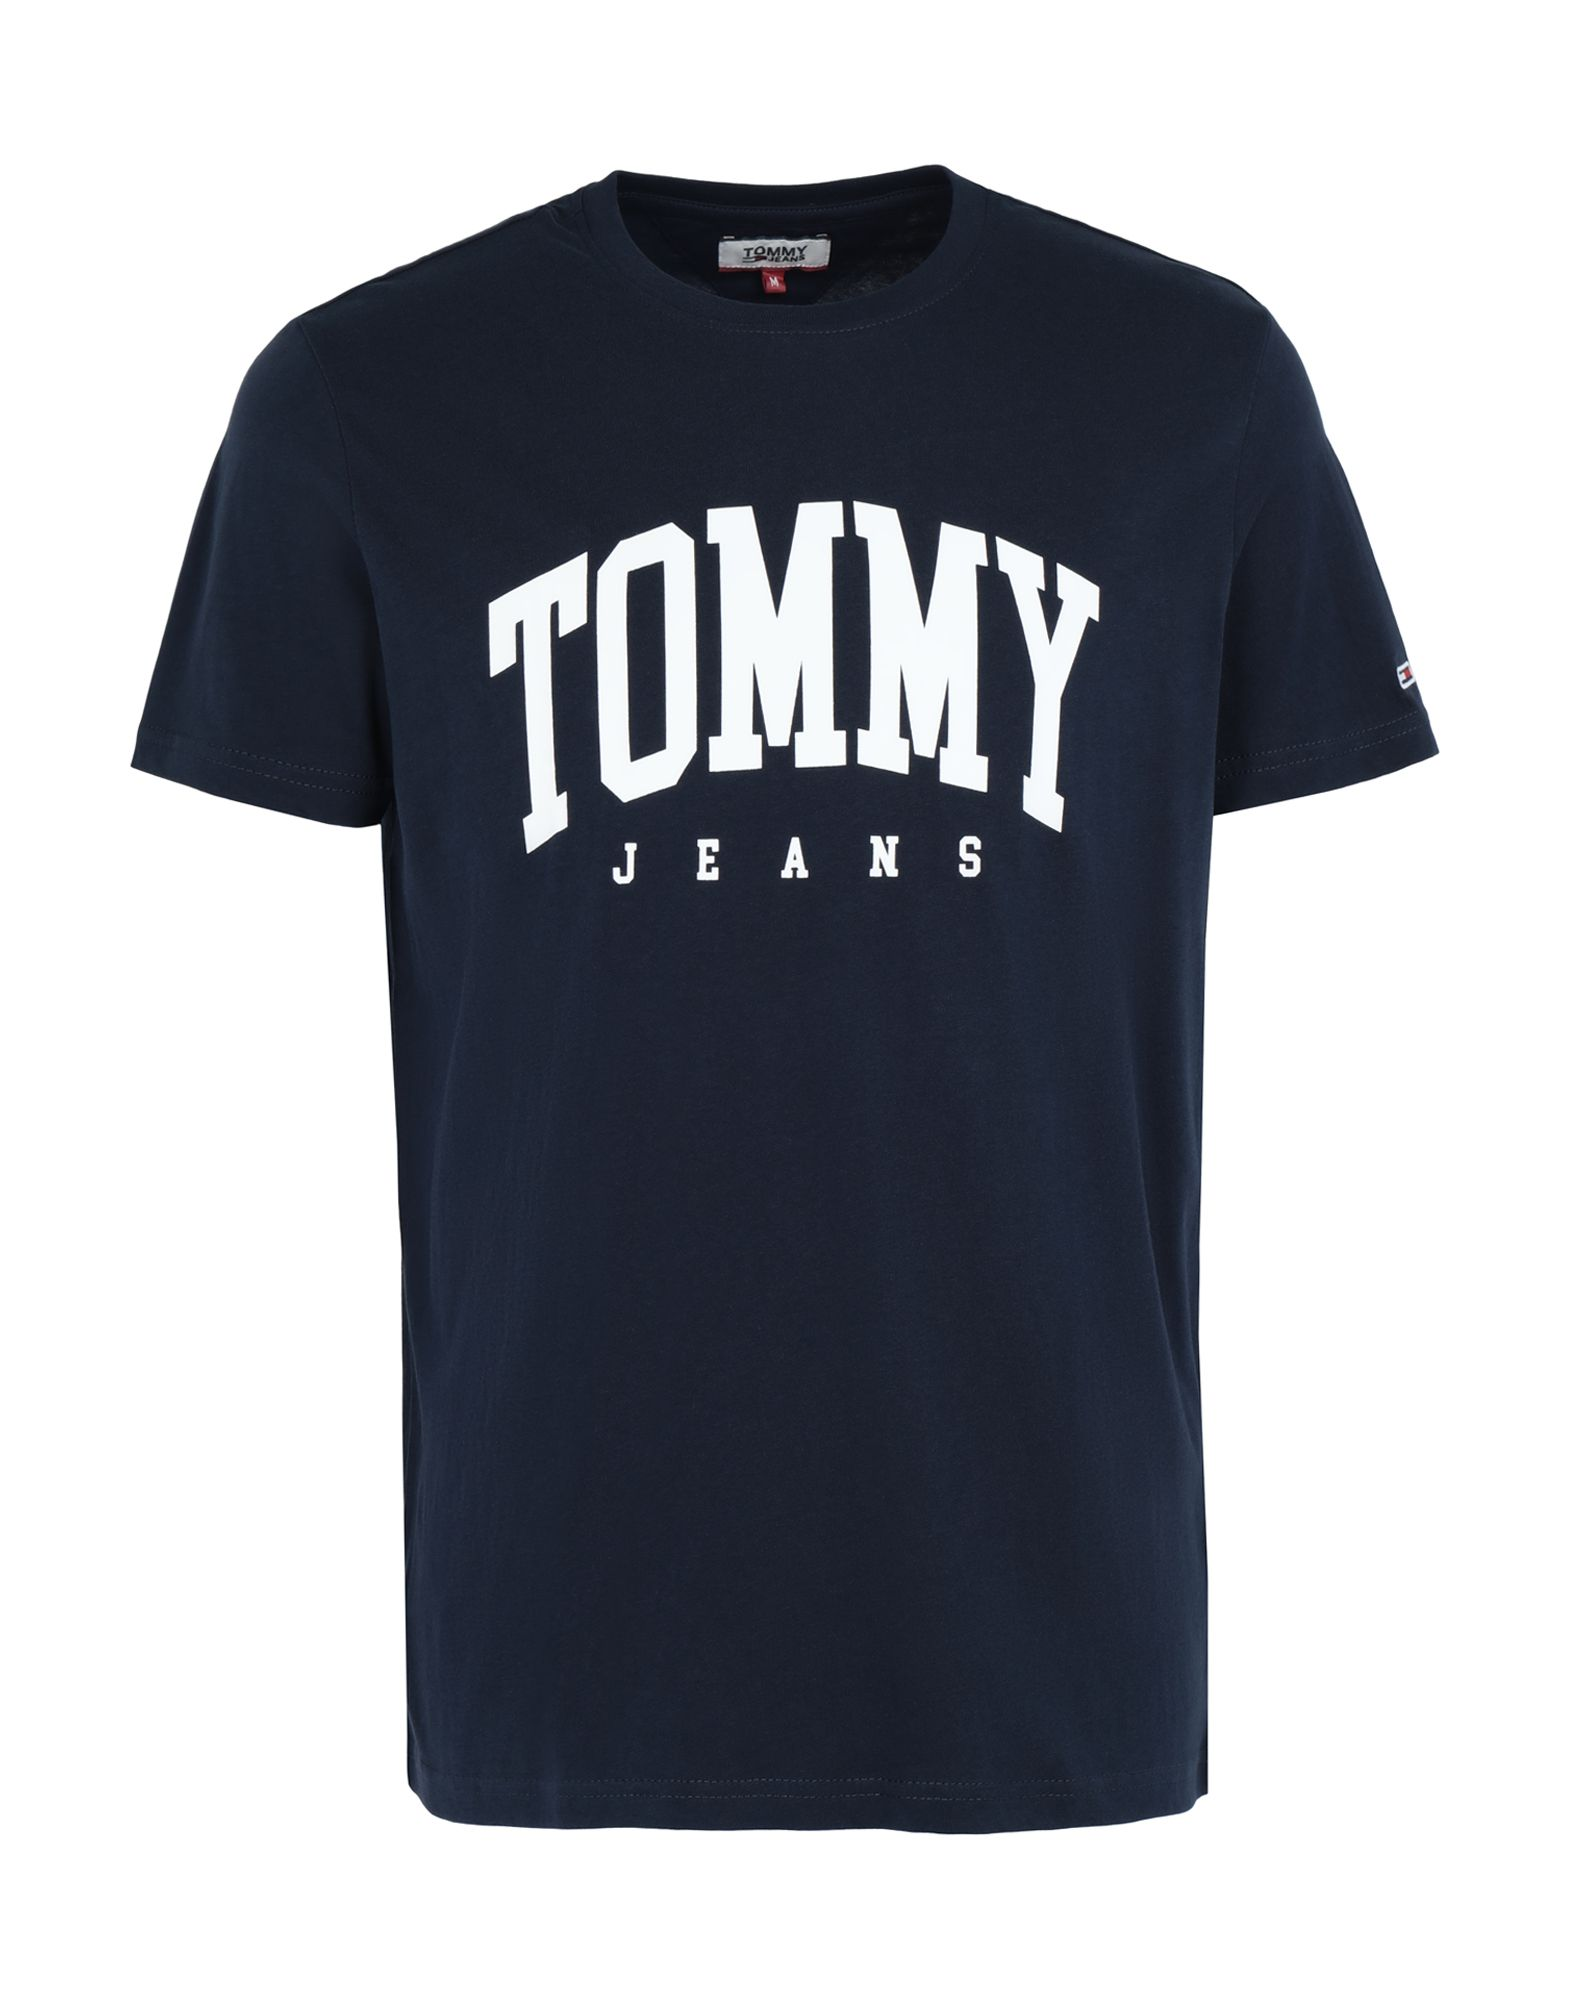 TOMMY JEANS Футболка футболка tommy jeans tommy jeans to052embwao5